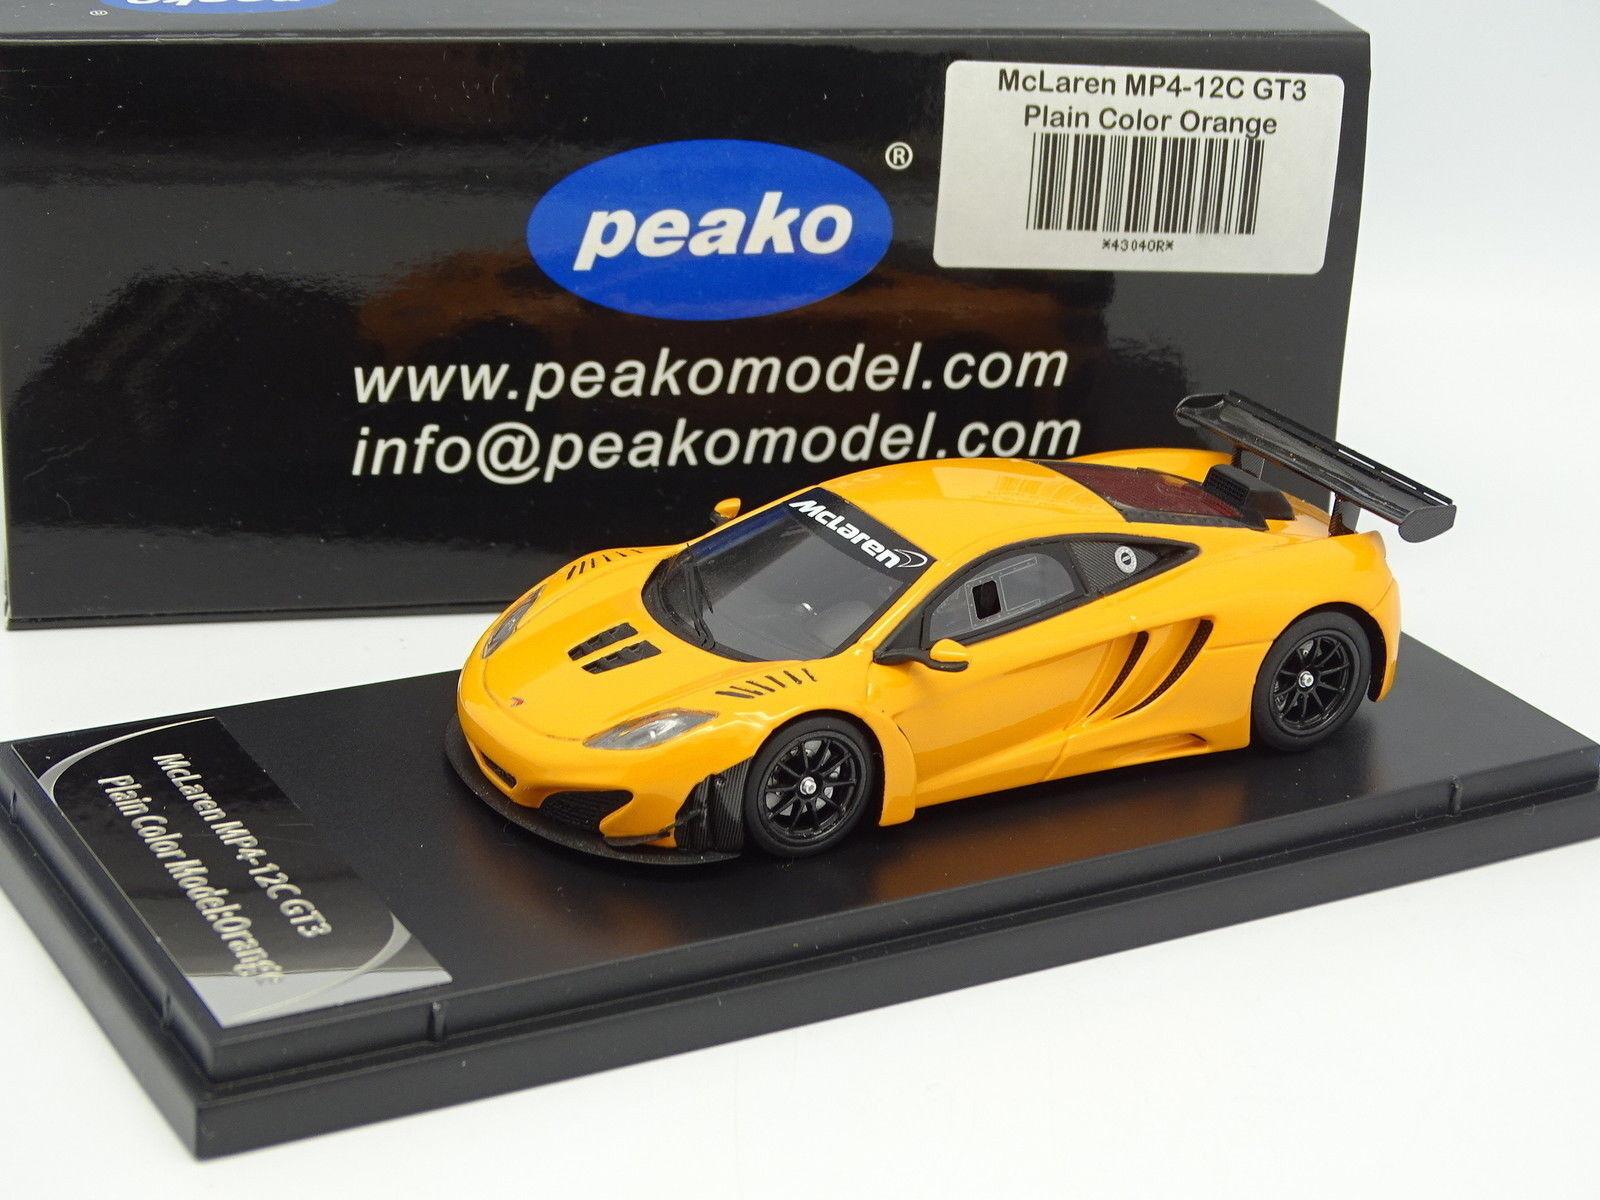 Peako resin 1 43 - mclaren mp4-12c gt3 plain color model orange